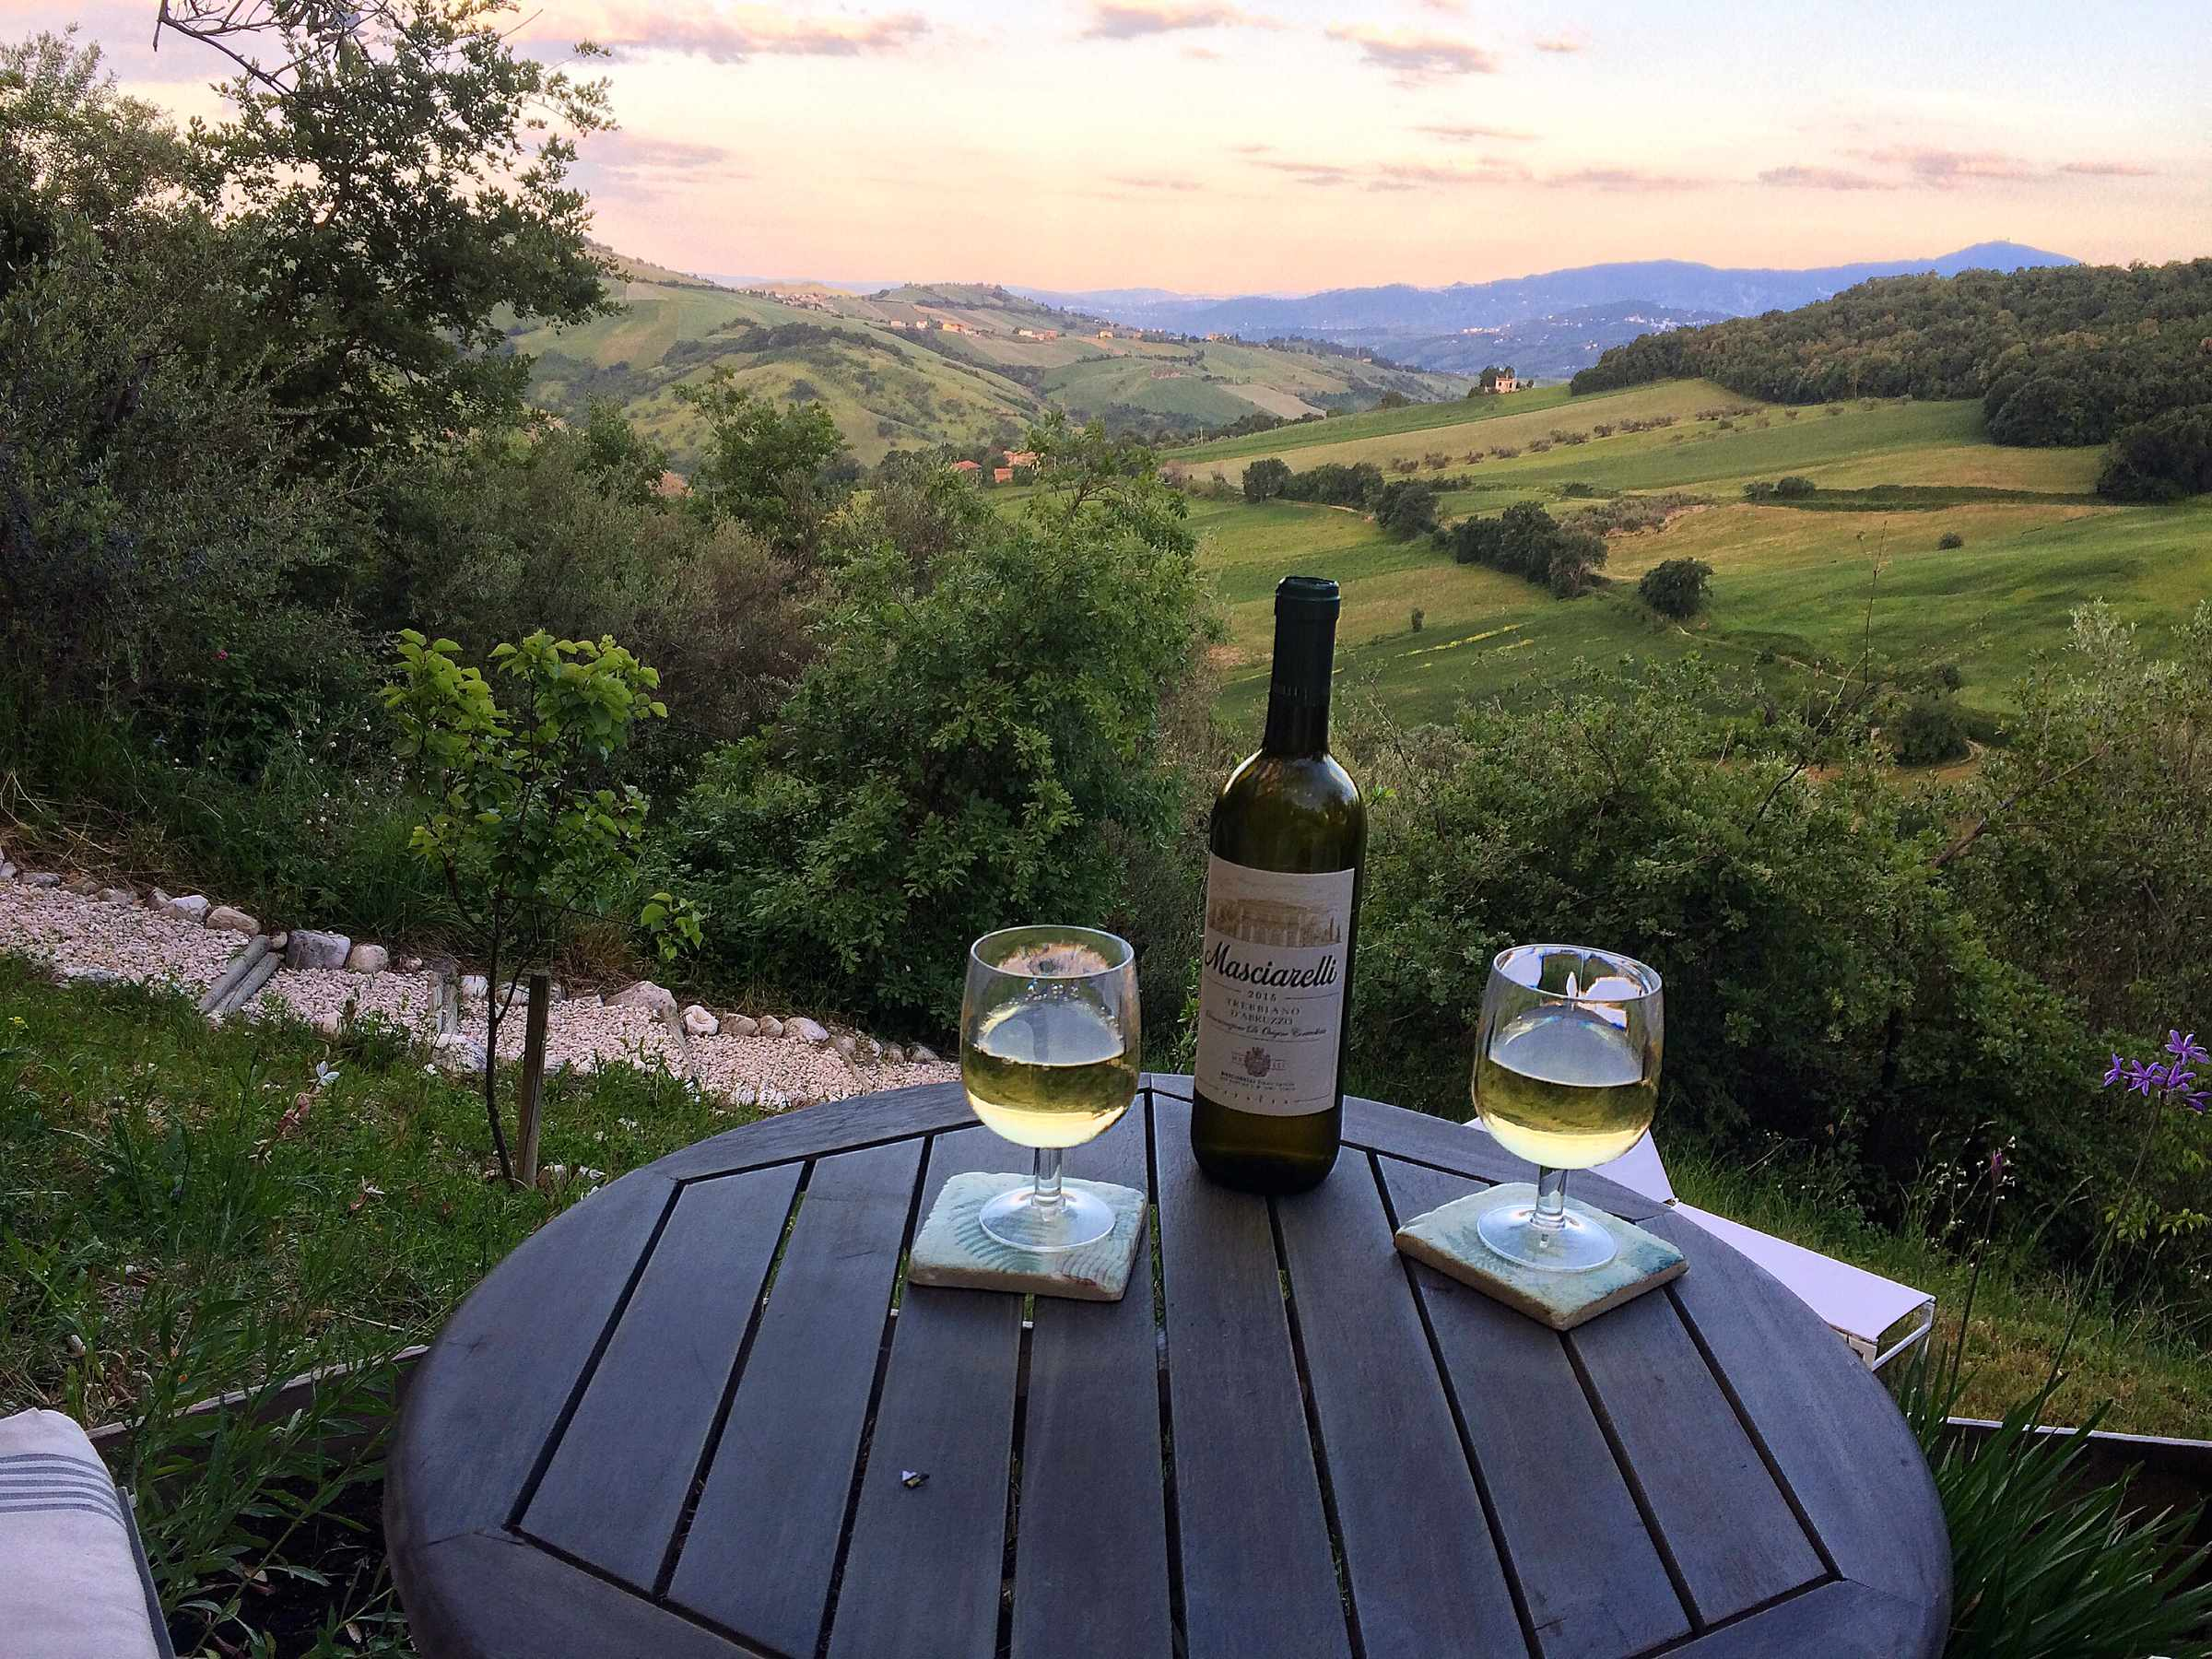 Wine at Fireflies and Figs, Abruzzo